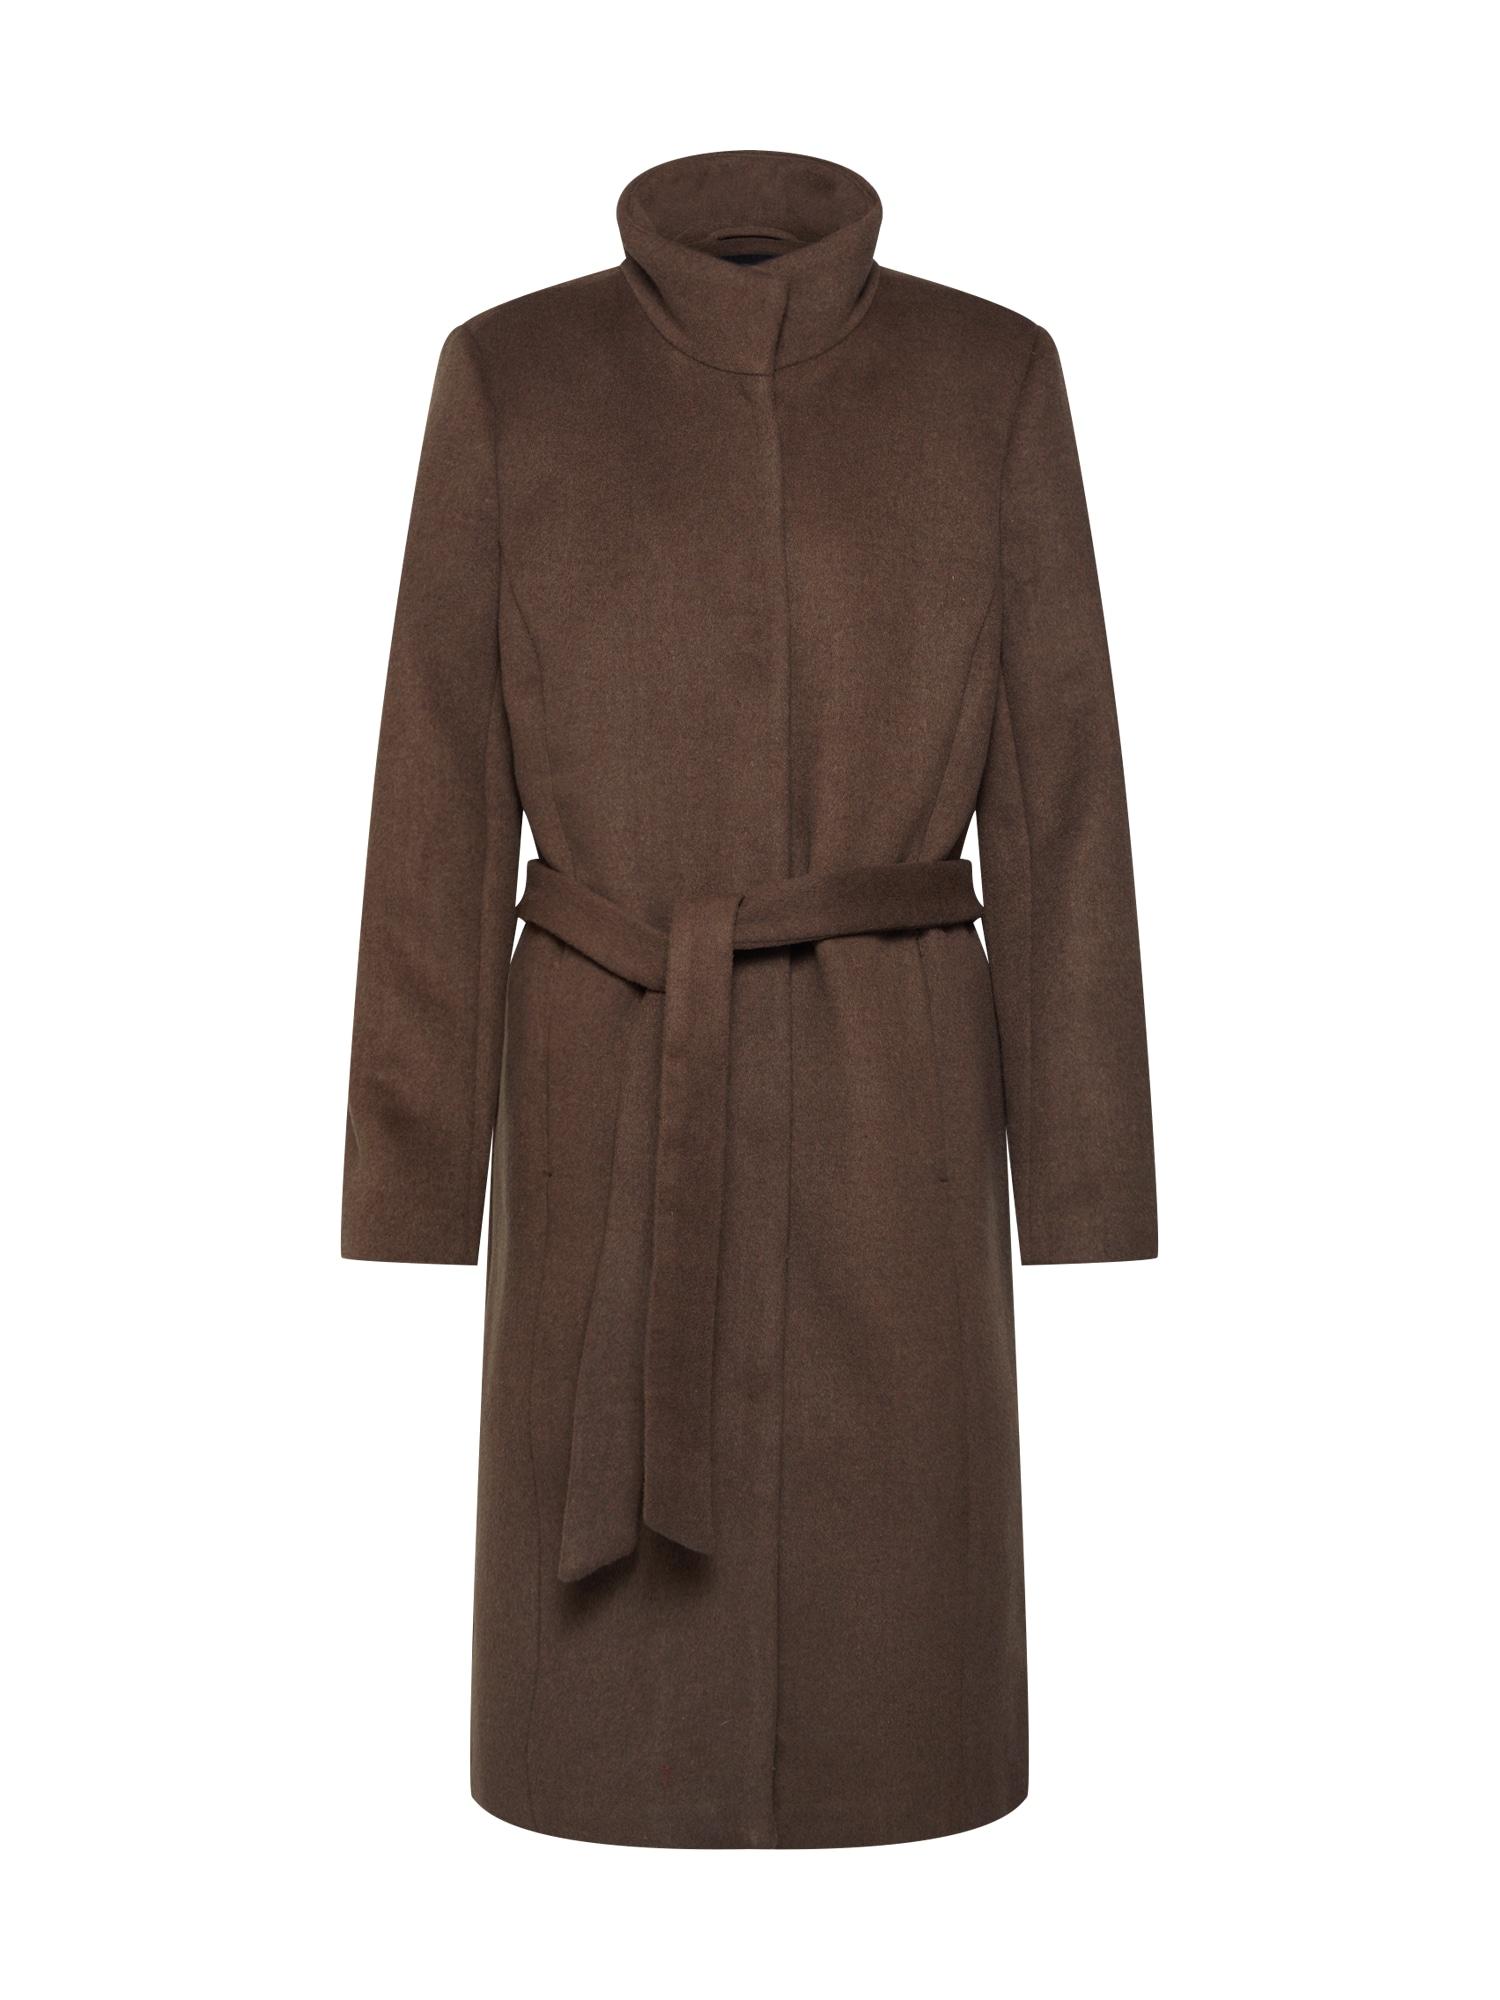 Přechodný kabát Jasmin Greta velbloudí BRUUNS BAZAAR